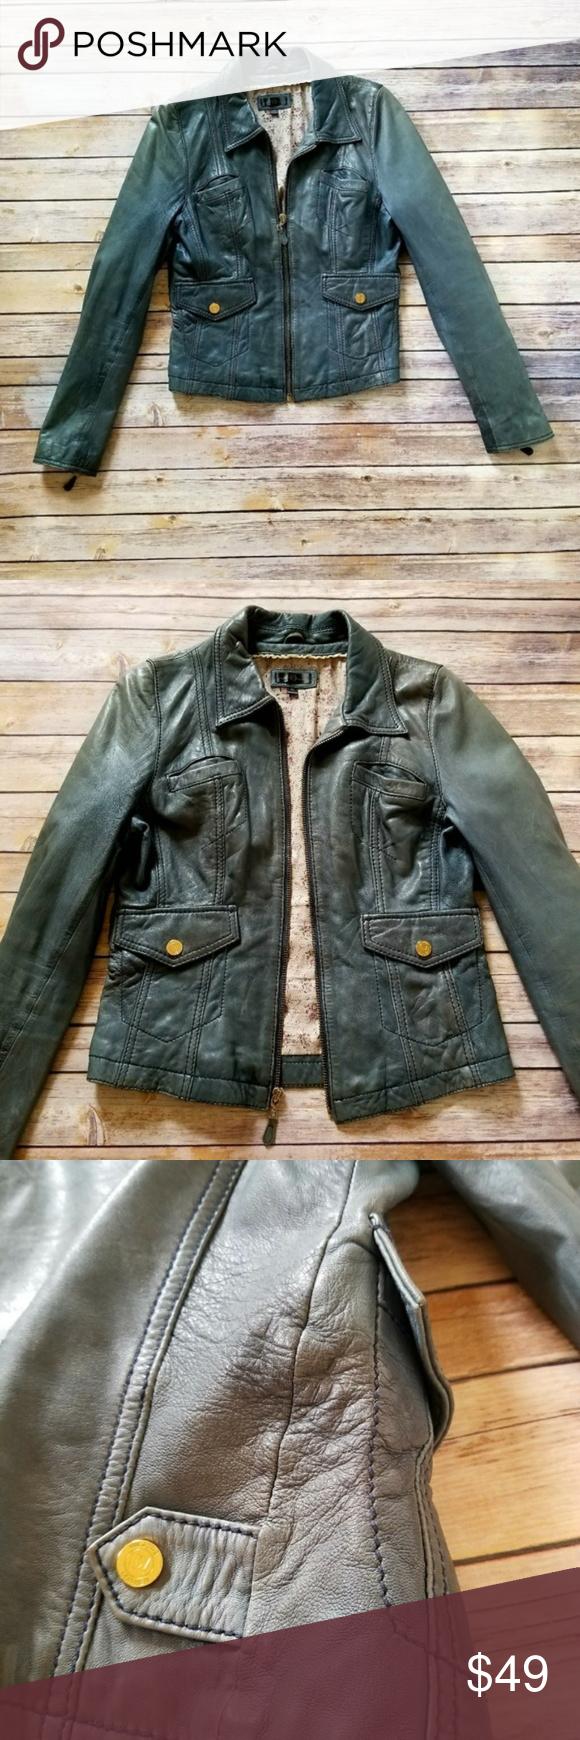 Wilson's Leather Genuine Leather Jacket Size M Genuine